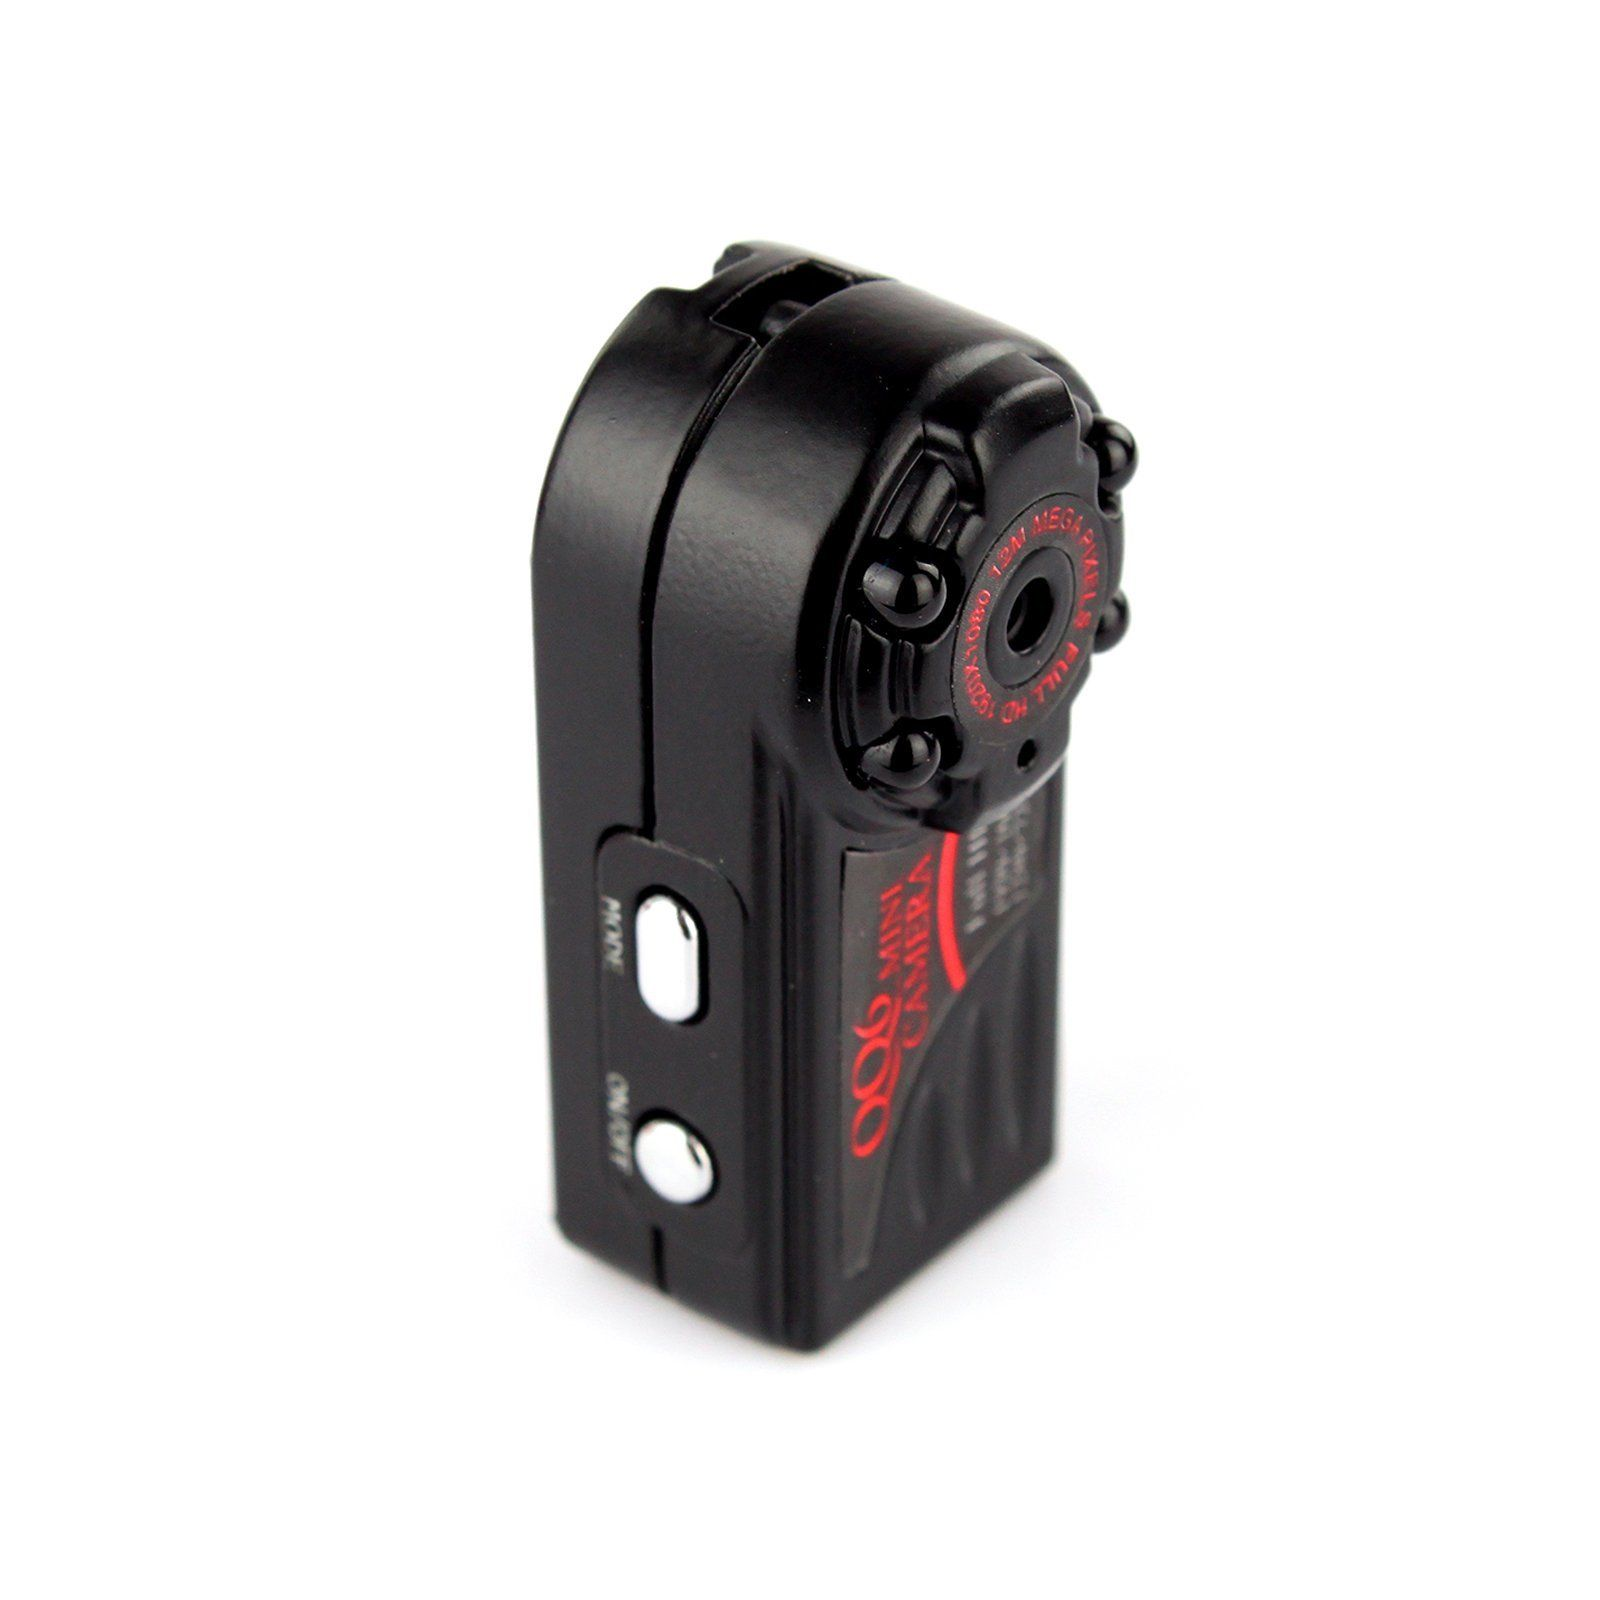 QQ6 Mini DV Full HD 1080P Digital Car Video Recorder Thumb Metal Mini Camera lc 08 mini dv headphone 1080p hd sport dv bluetooth headset stereo neck strap video recorder